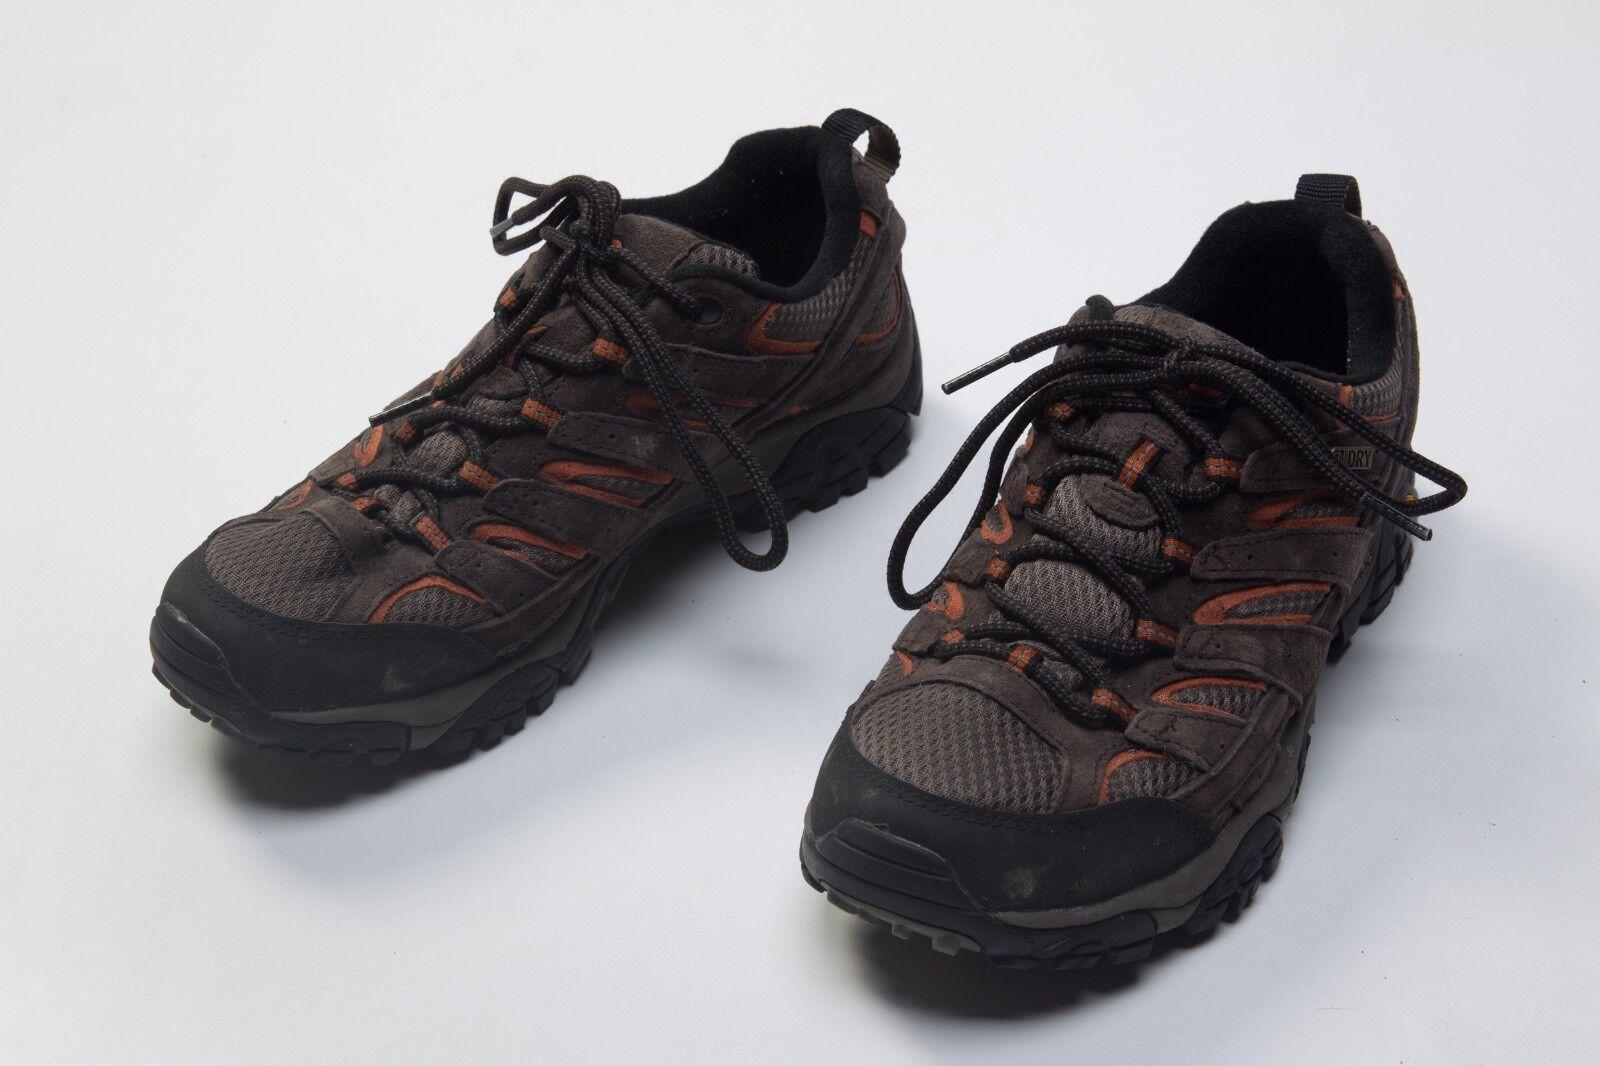 2d73620e9d04 Men s Merrell Moab 2 Waterproof WP Low Hiking Trail shoes Size Sz US 7.5  US7.